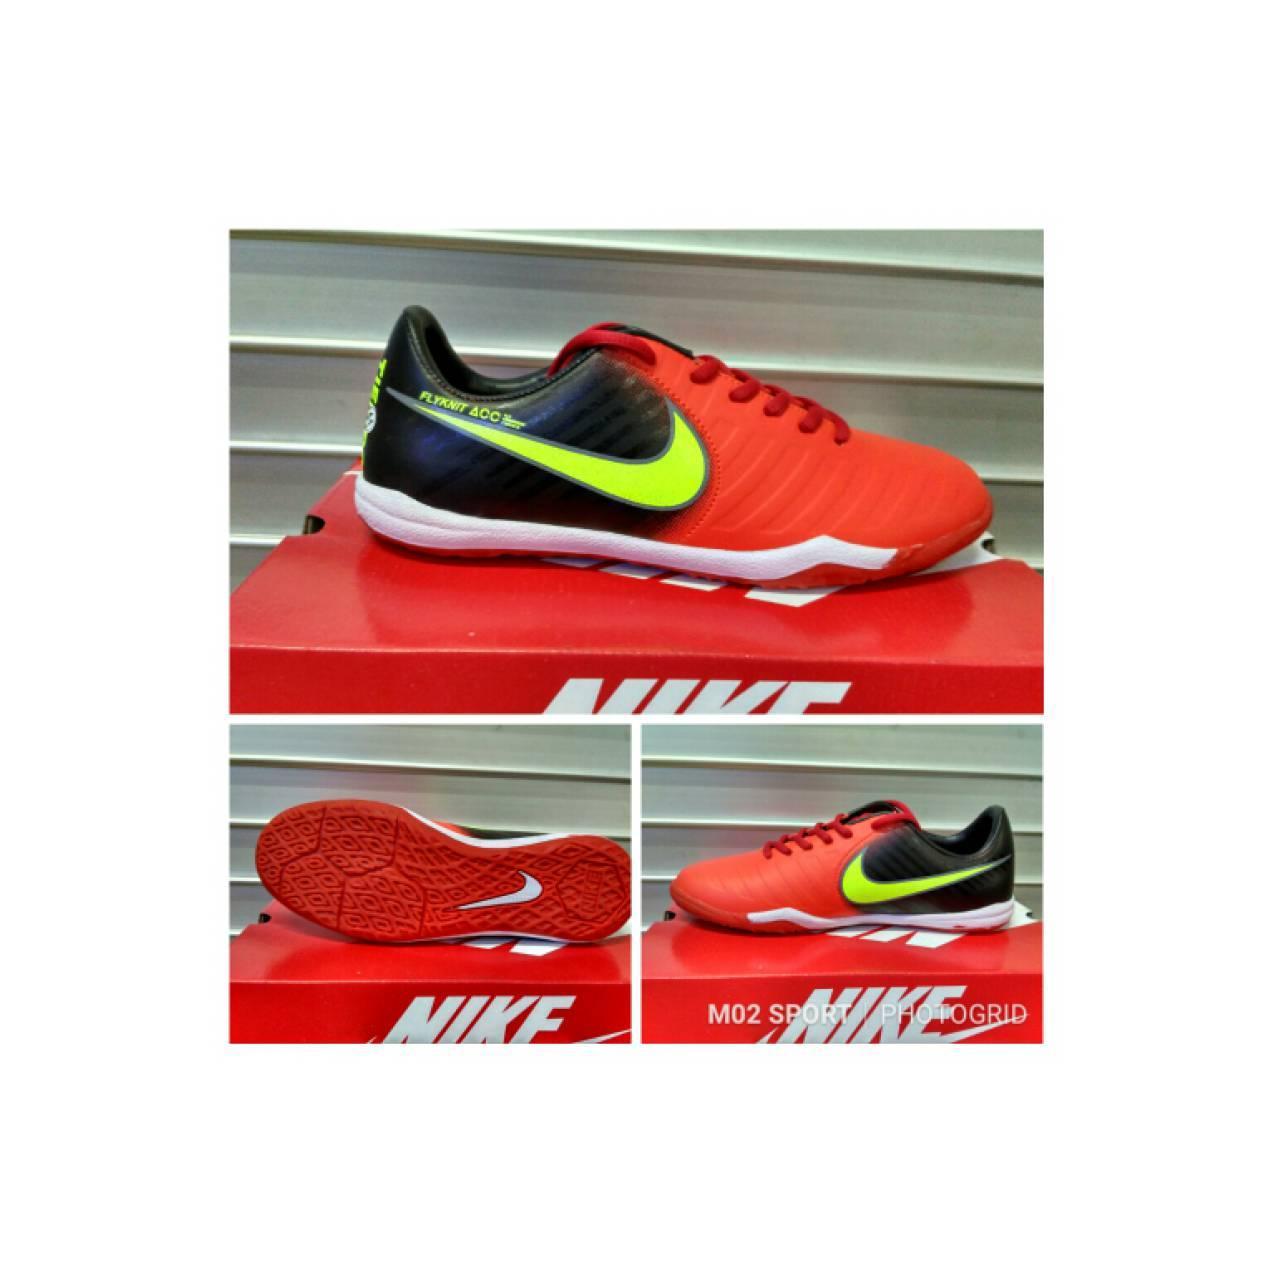 Sepatu futsal nike Tiempo hitam merah sol karet